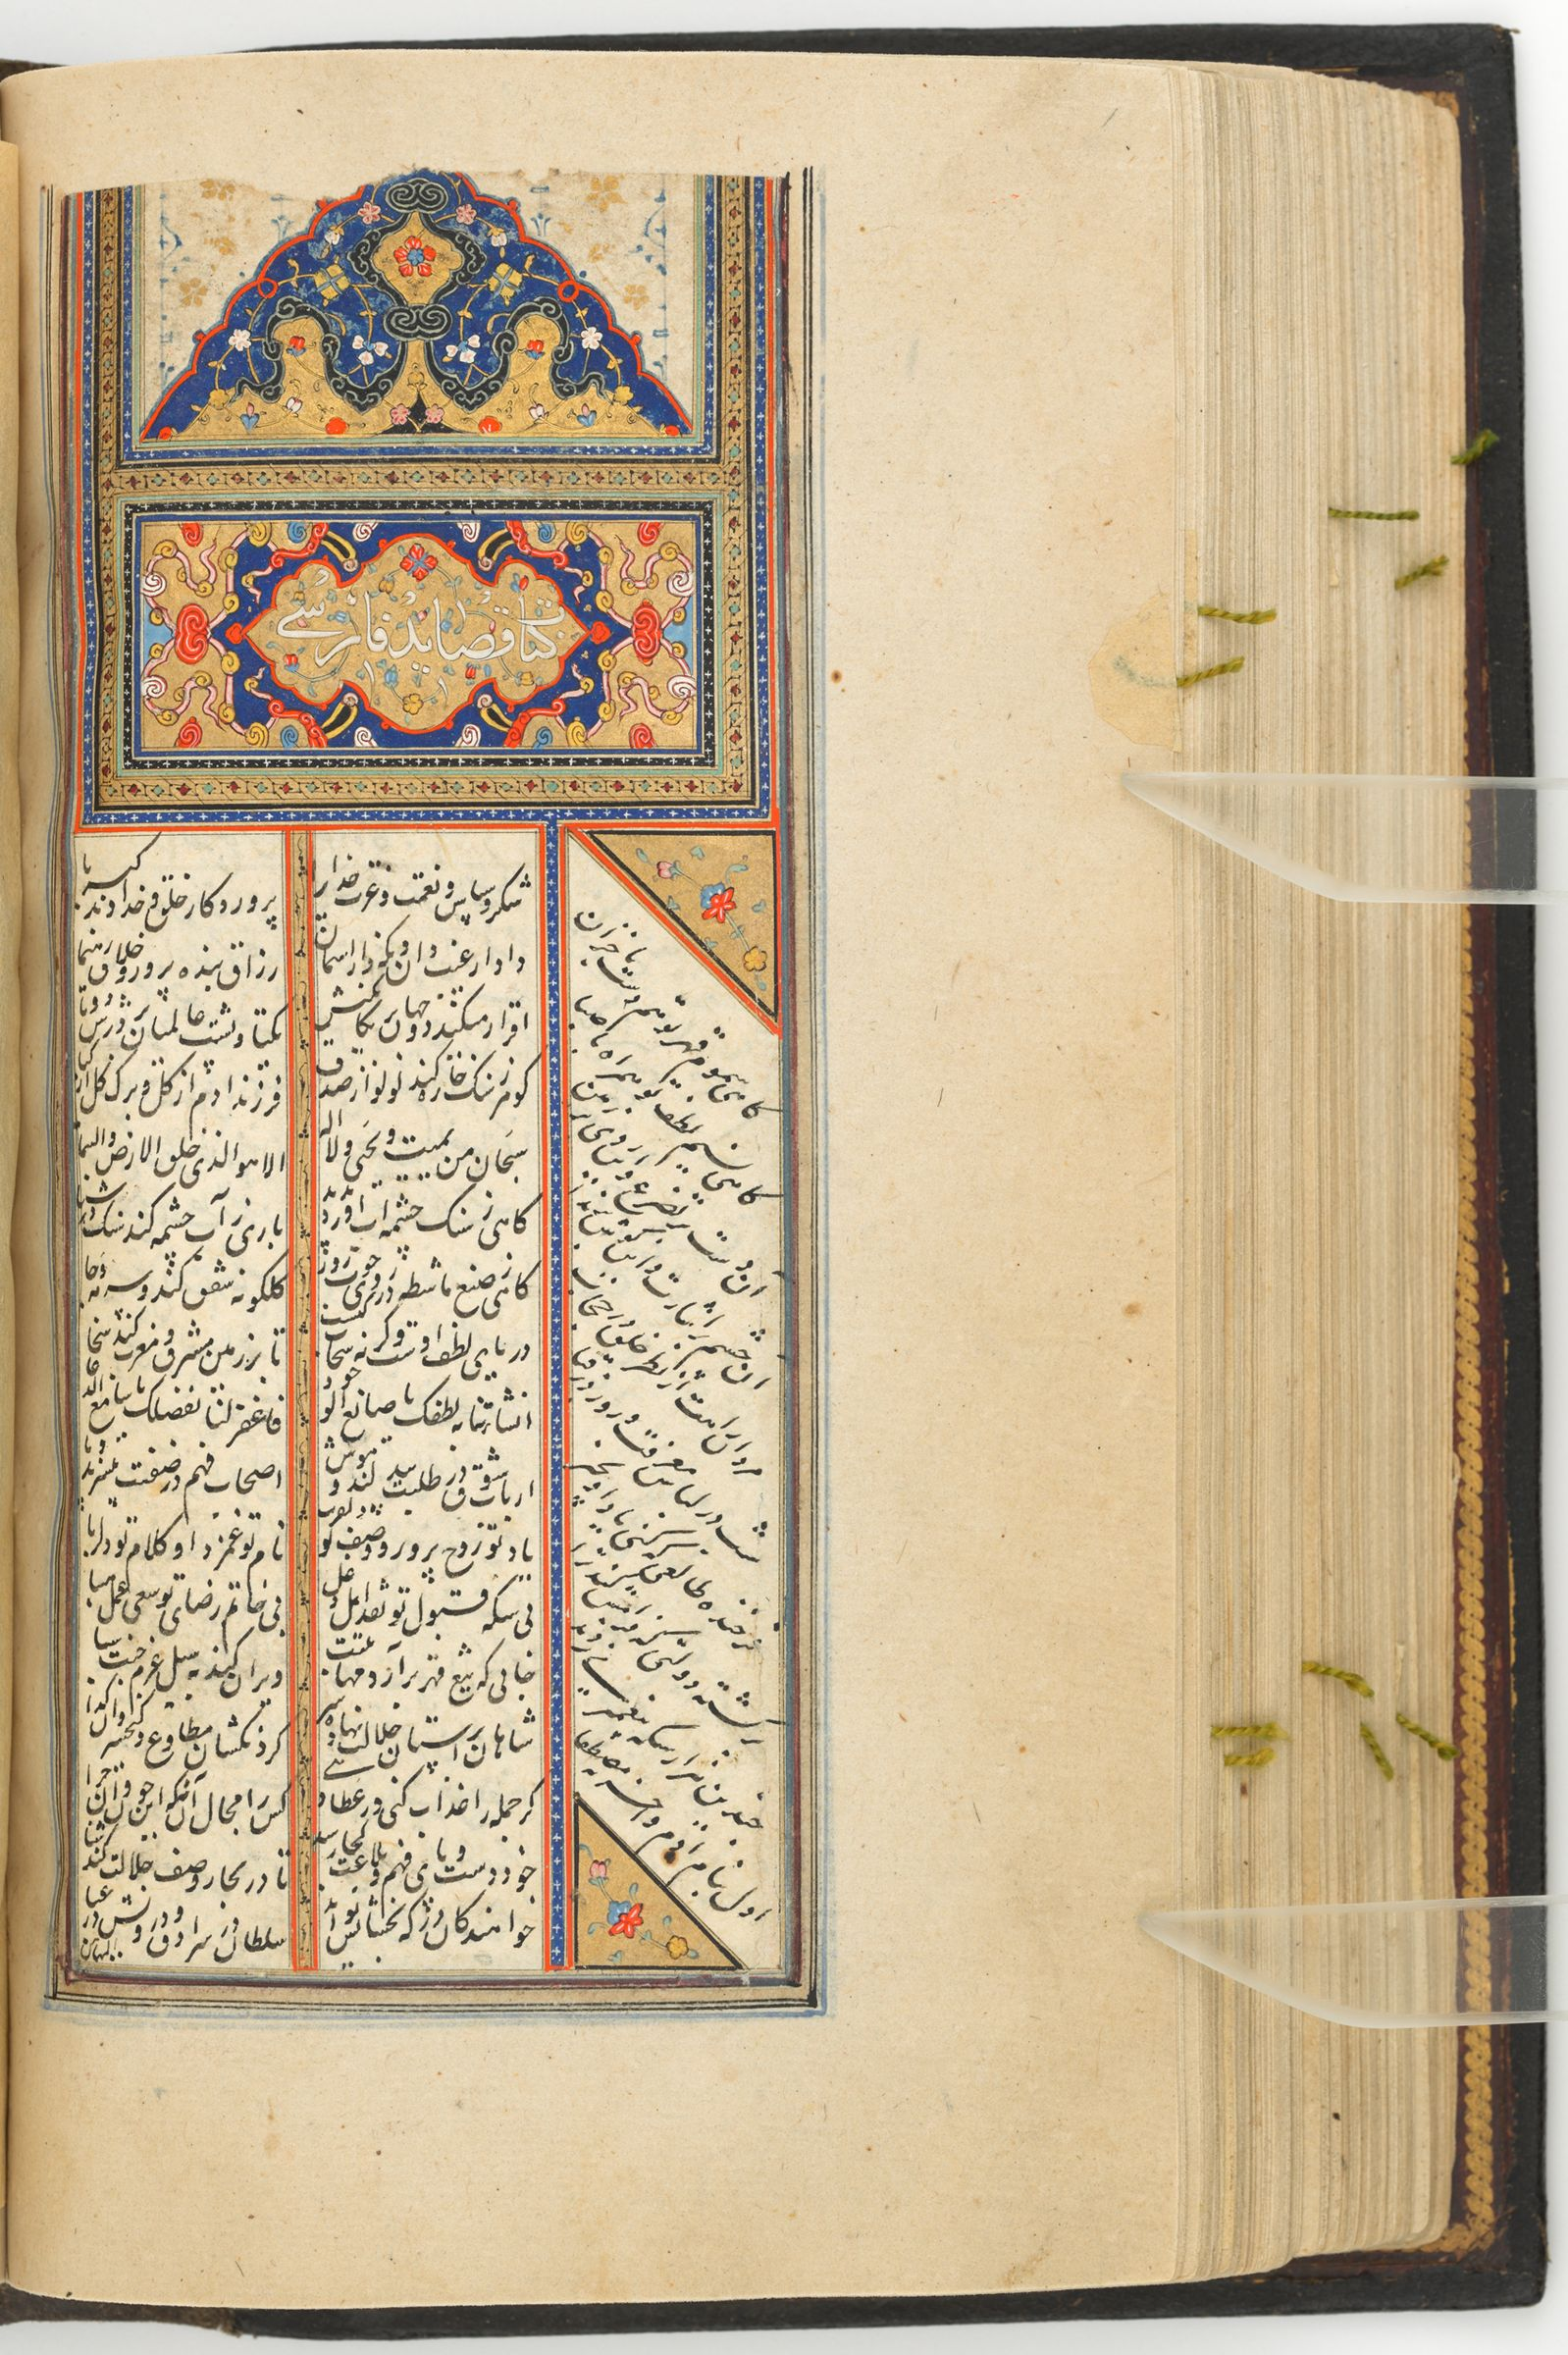 Text Folio With An Illuminated Heading (Text Recto; Text With Illuminated Heading Verso Of Folio 157), From A Manuscript Of The Kulliyat Of Sa'di